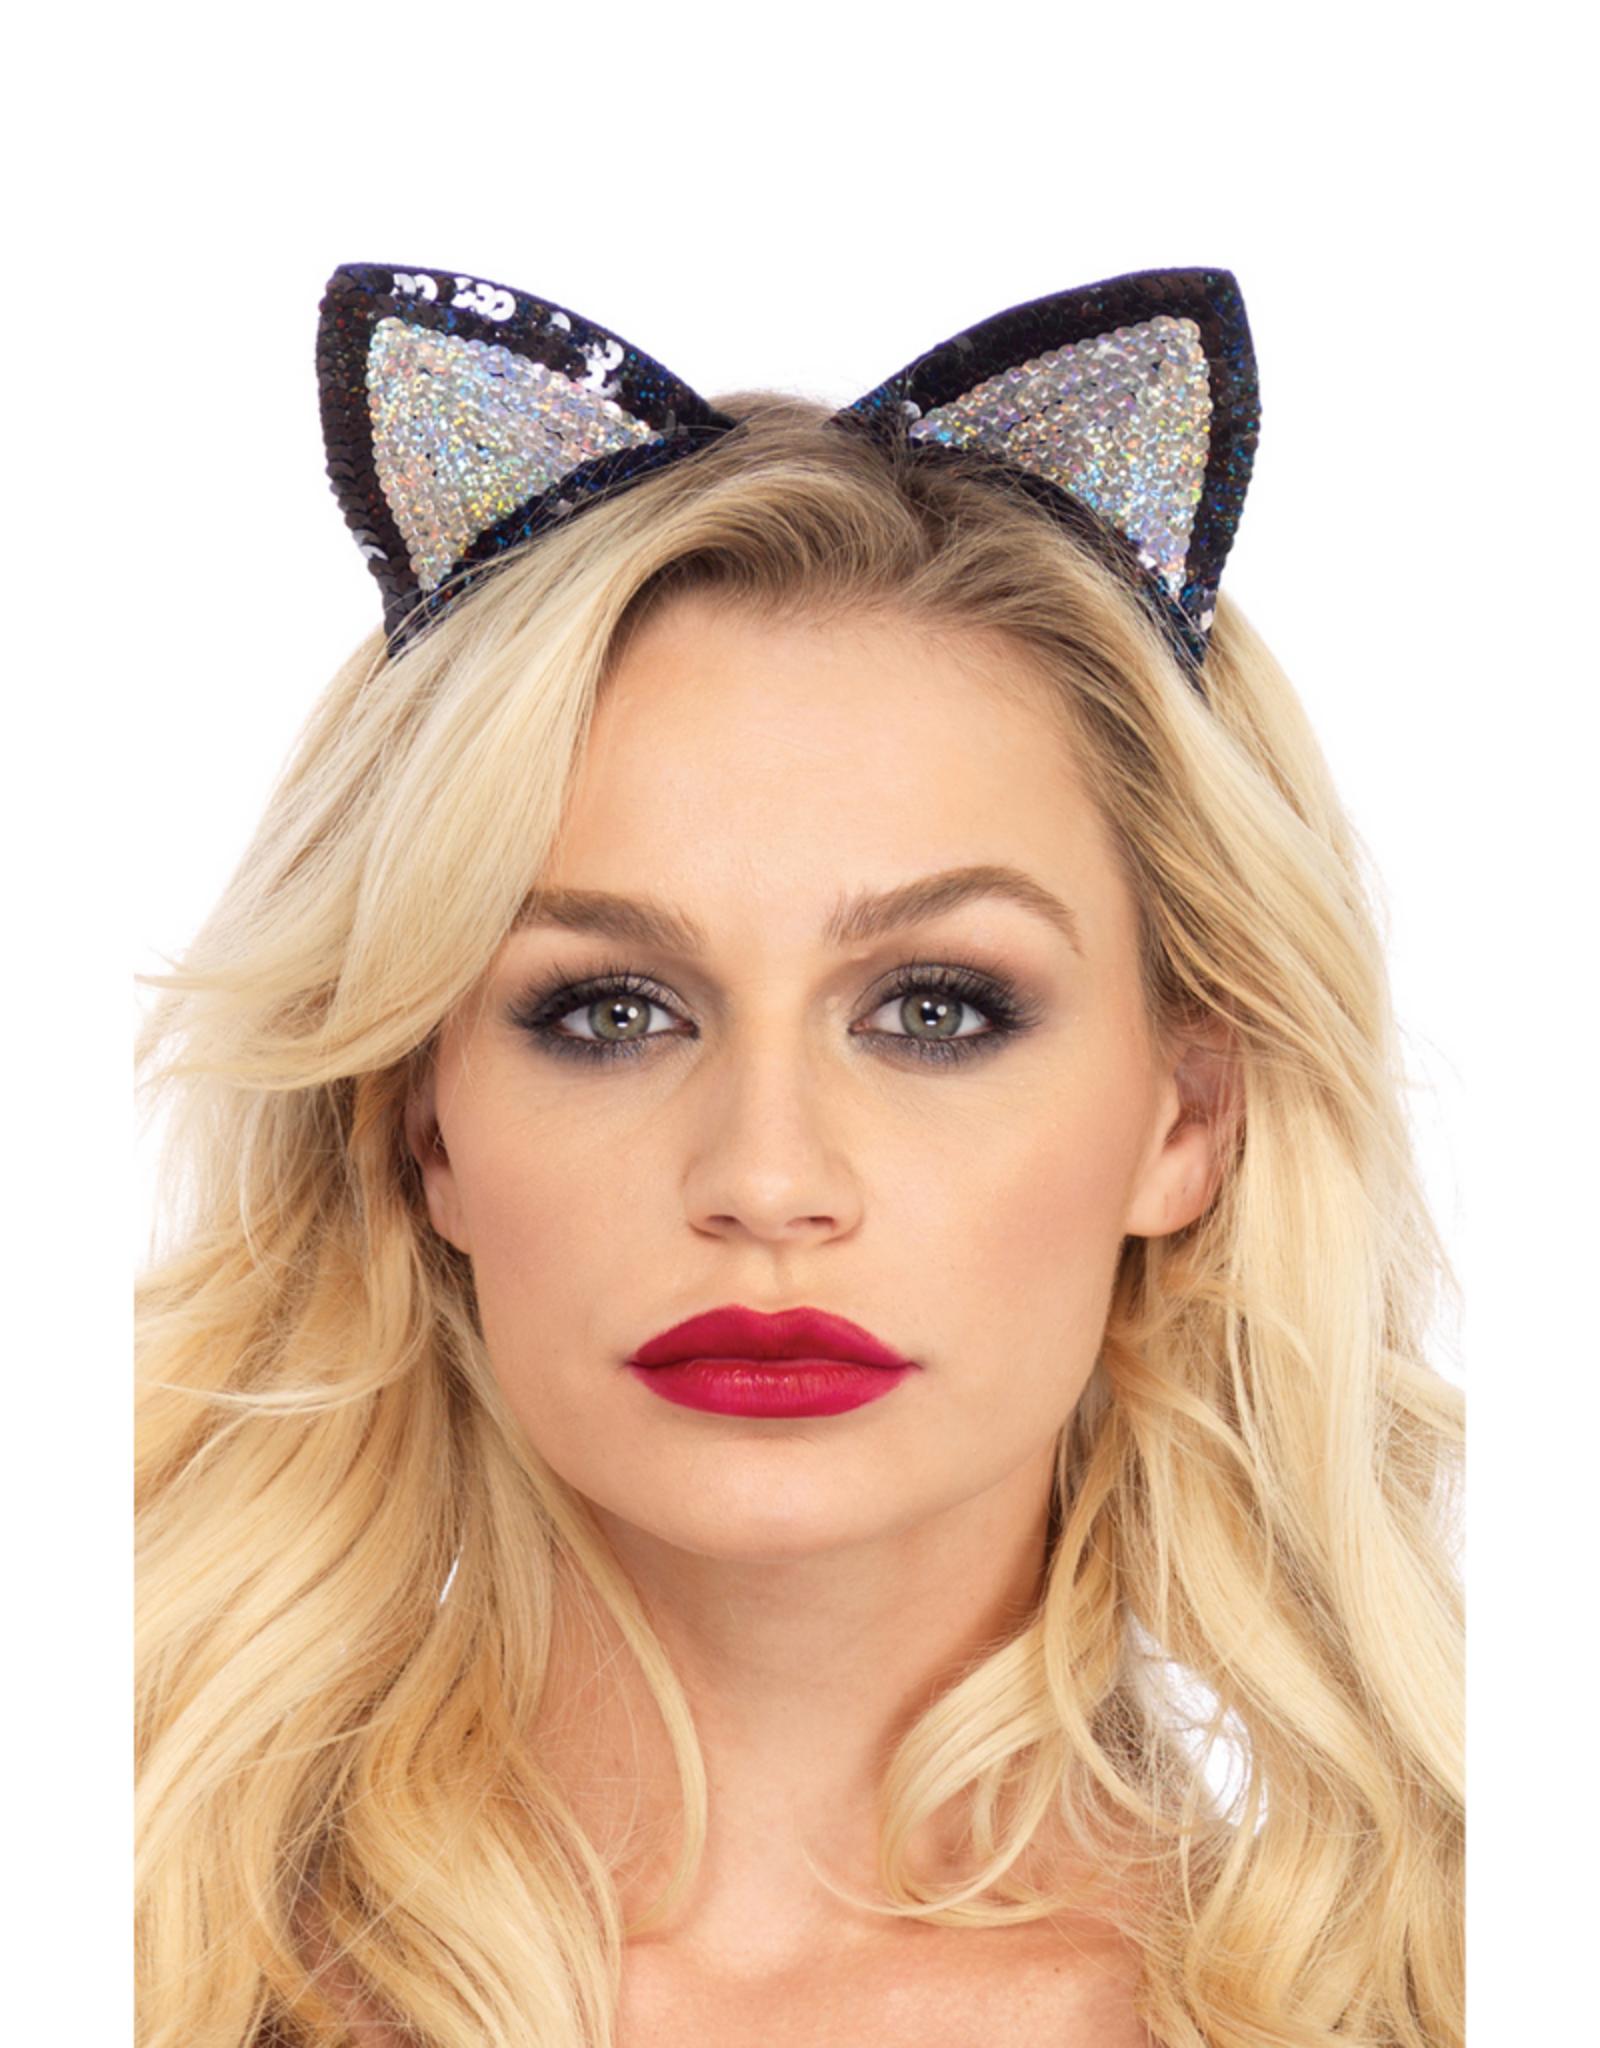 ANIMAL HEADBAND-CAT EARS, SEQUIN, SILVER